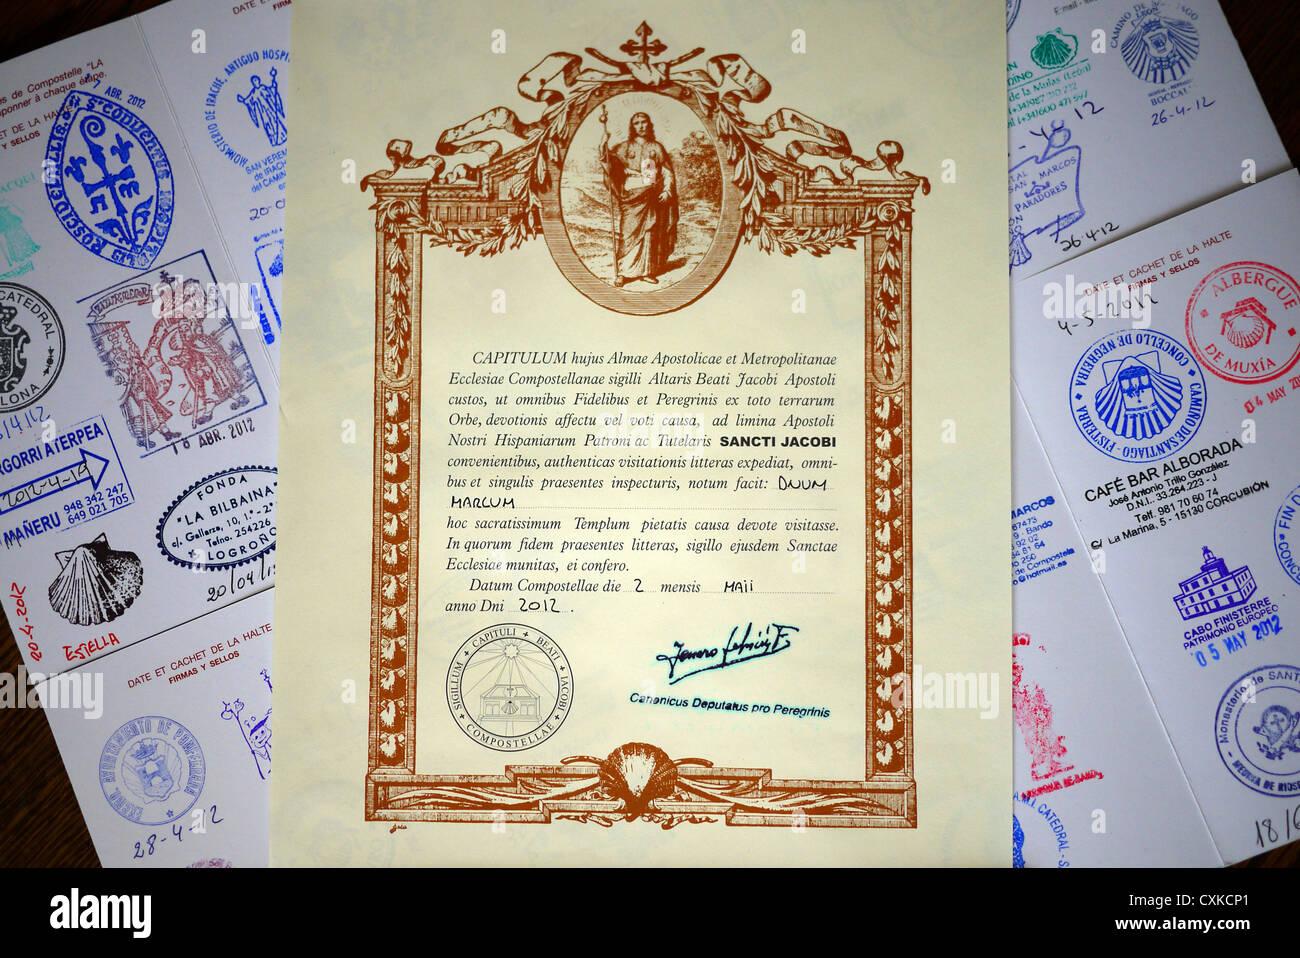 Santiago de Compostela Pilgrims passport and Compostela. - Stock Image